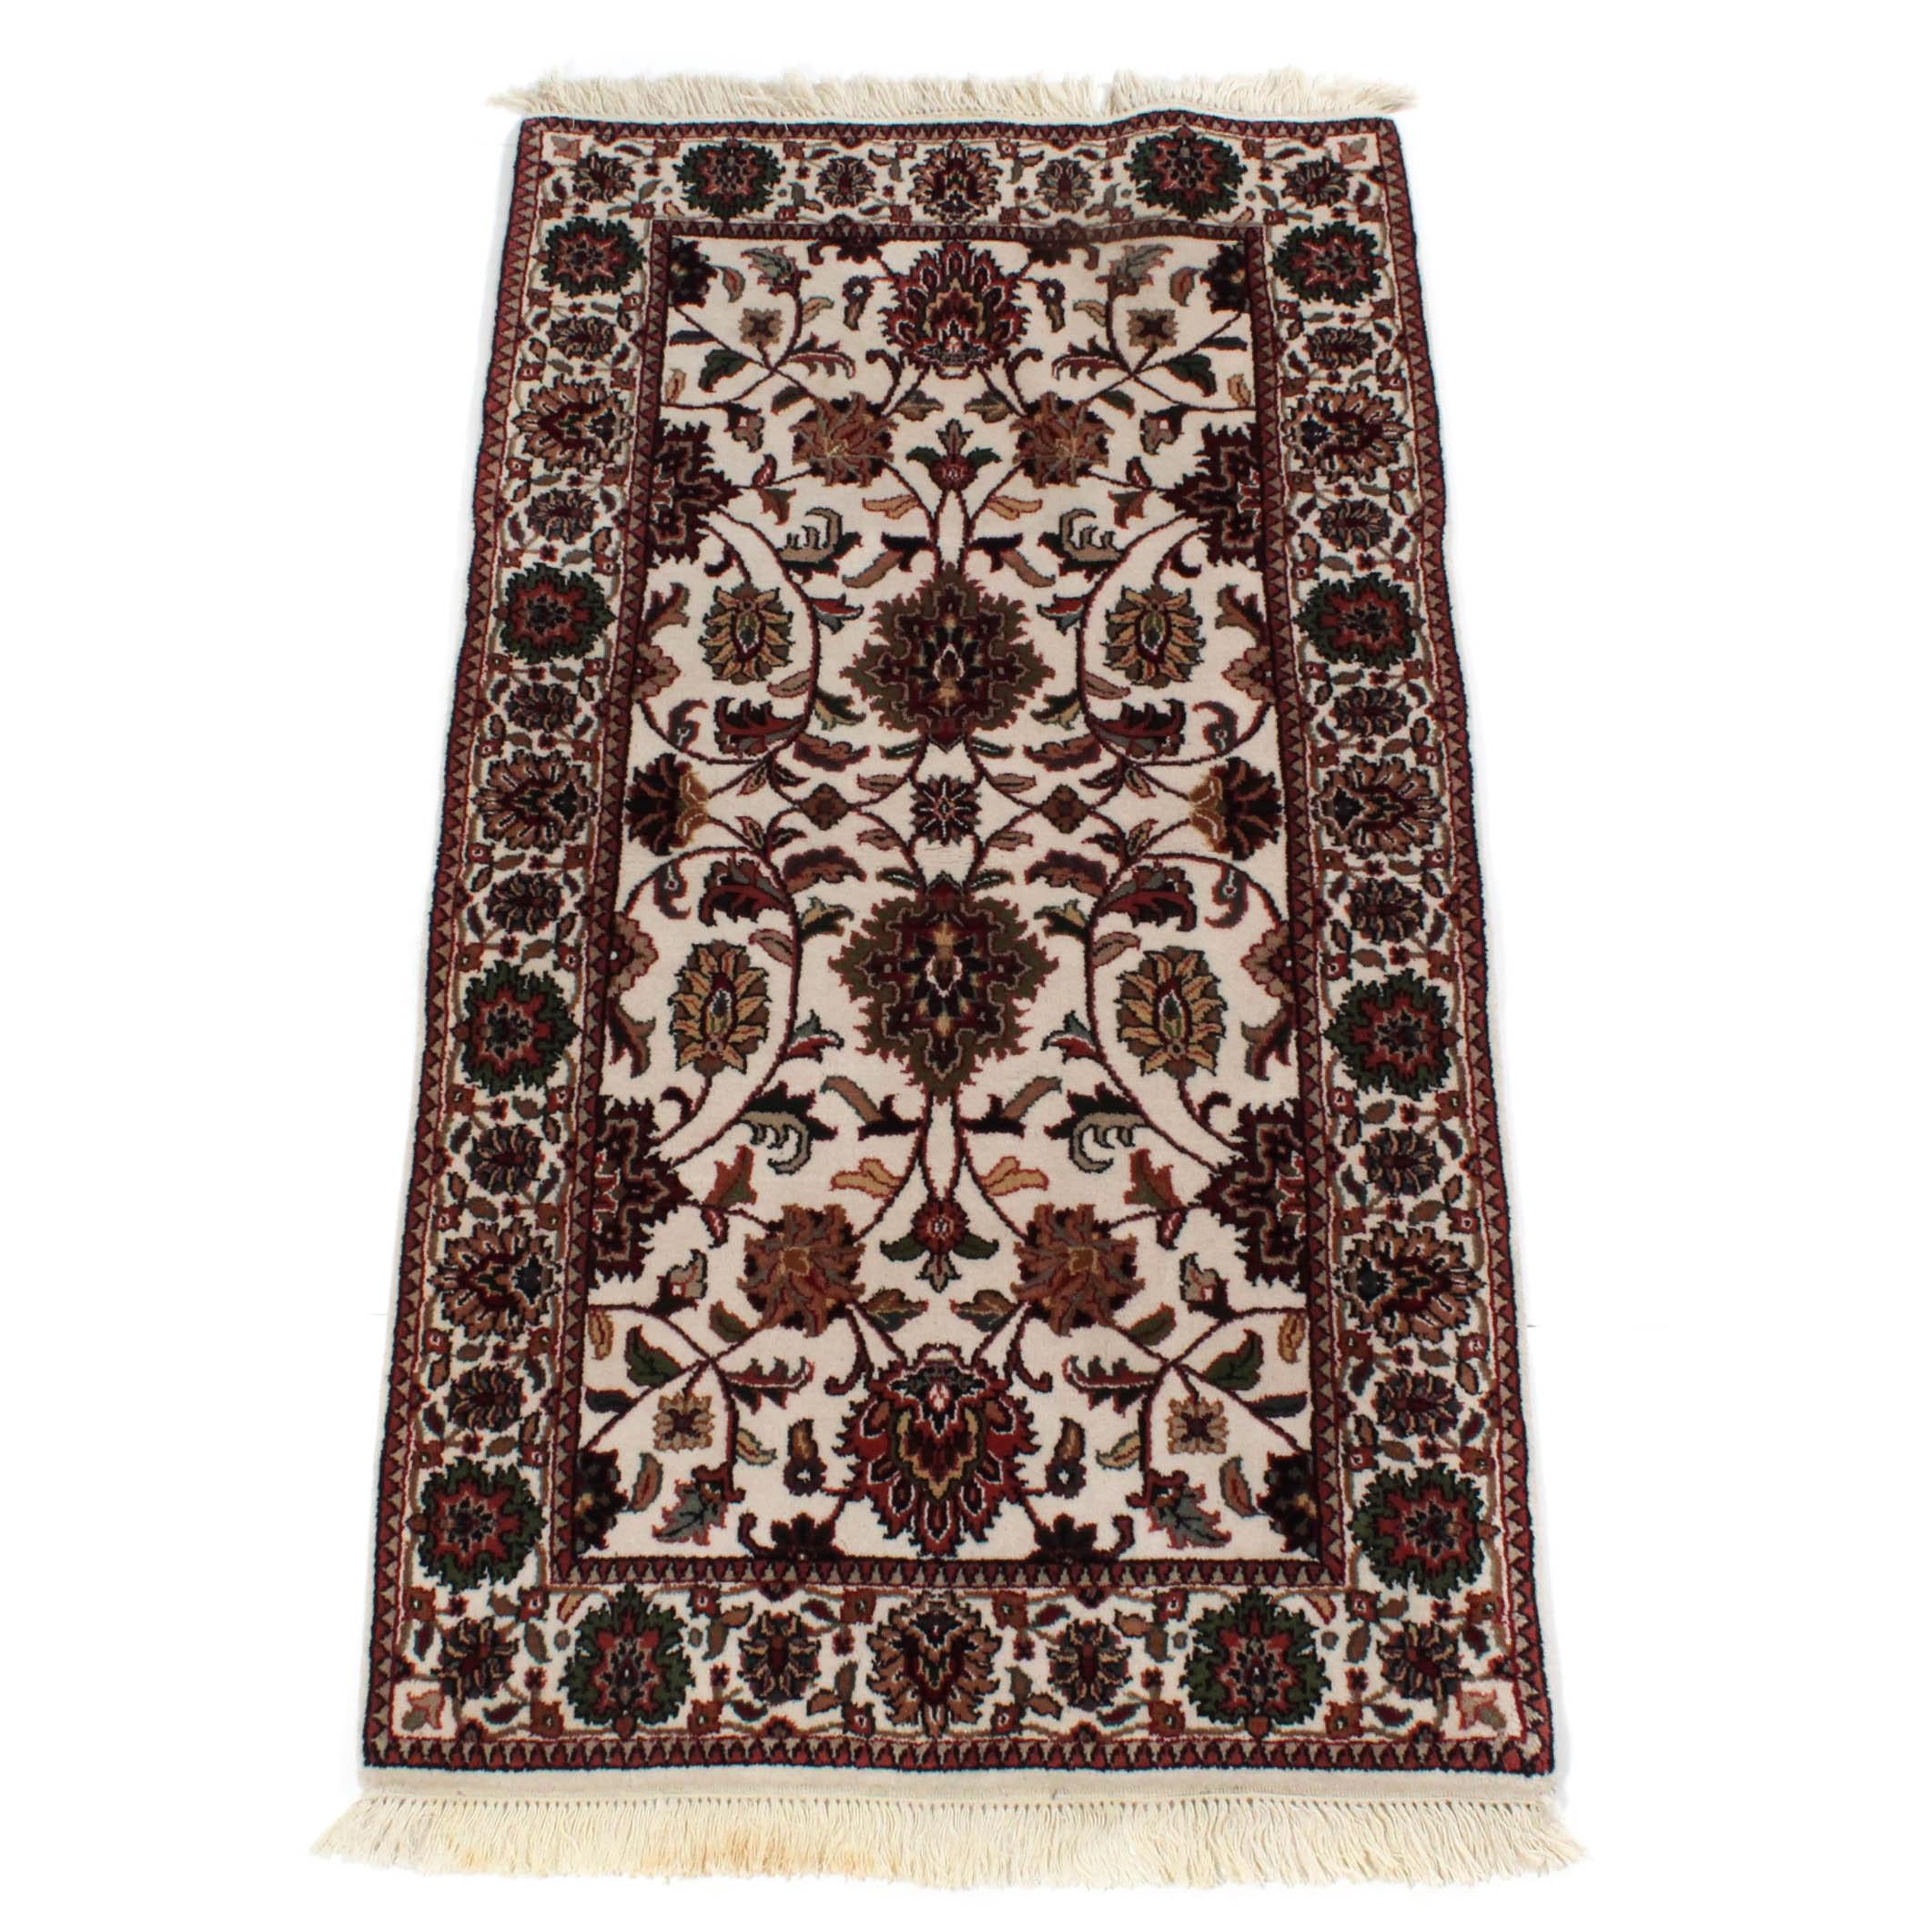 2'10 x 5'8 Fine Hand-Knotted Indo-Persian Mashhad Rug